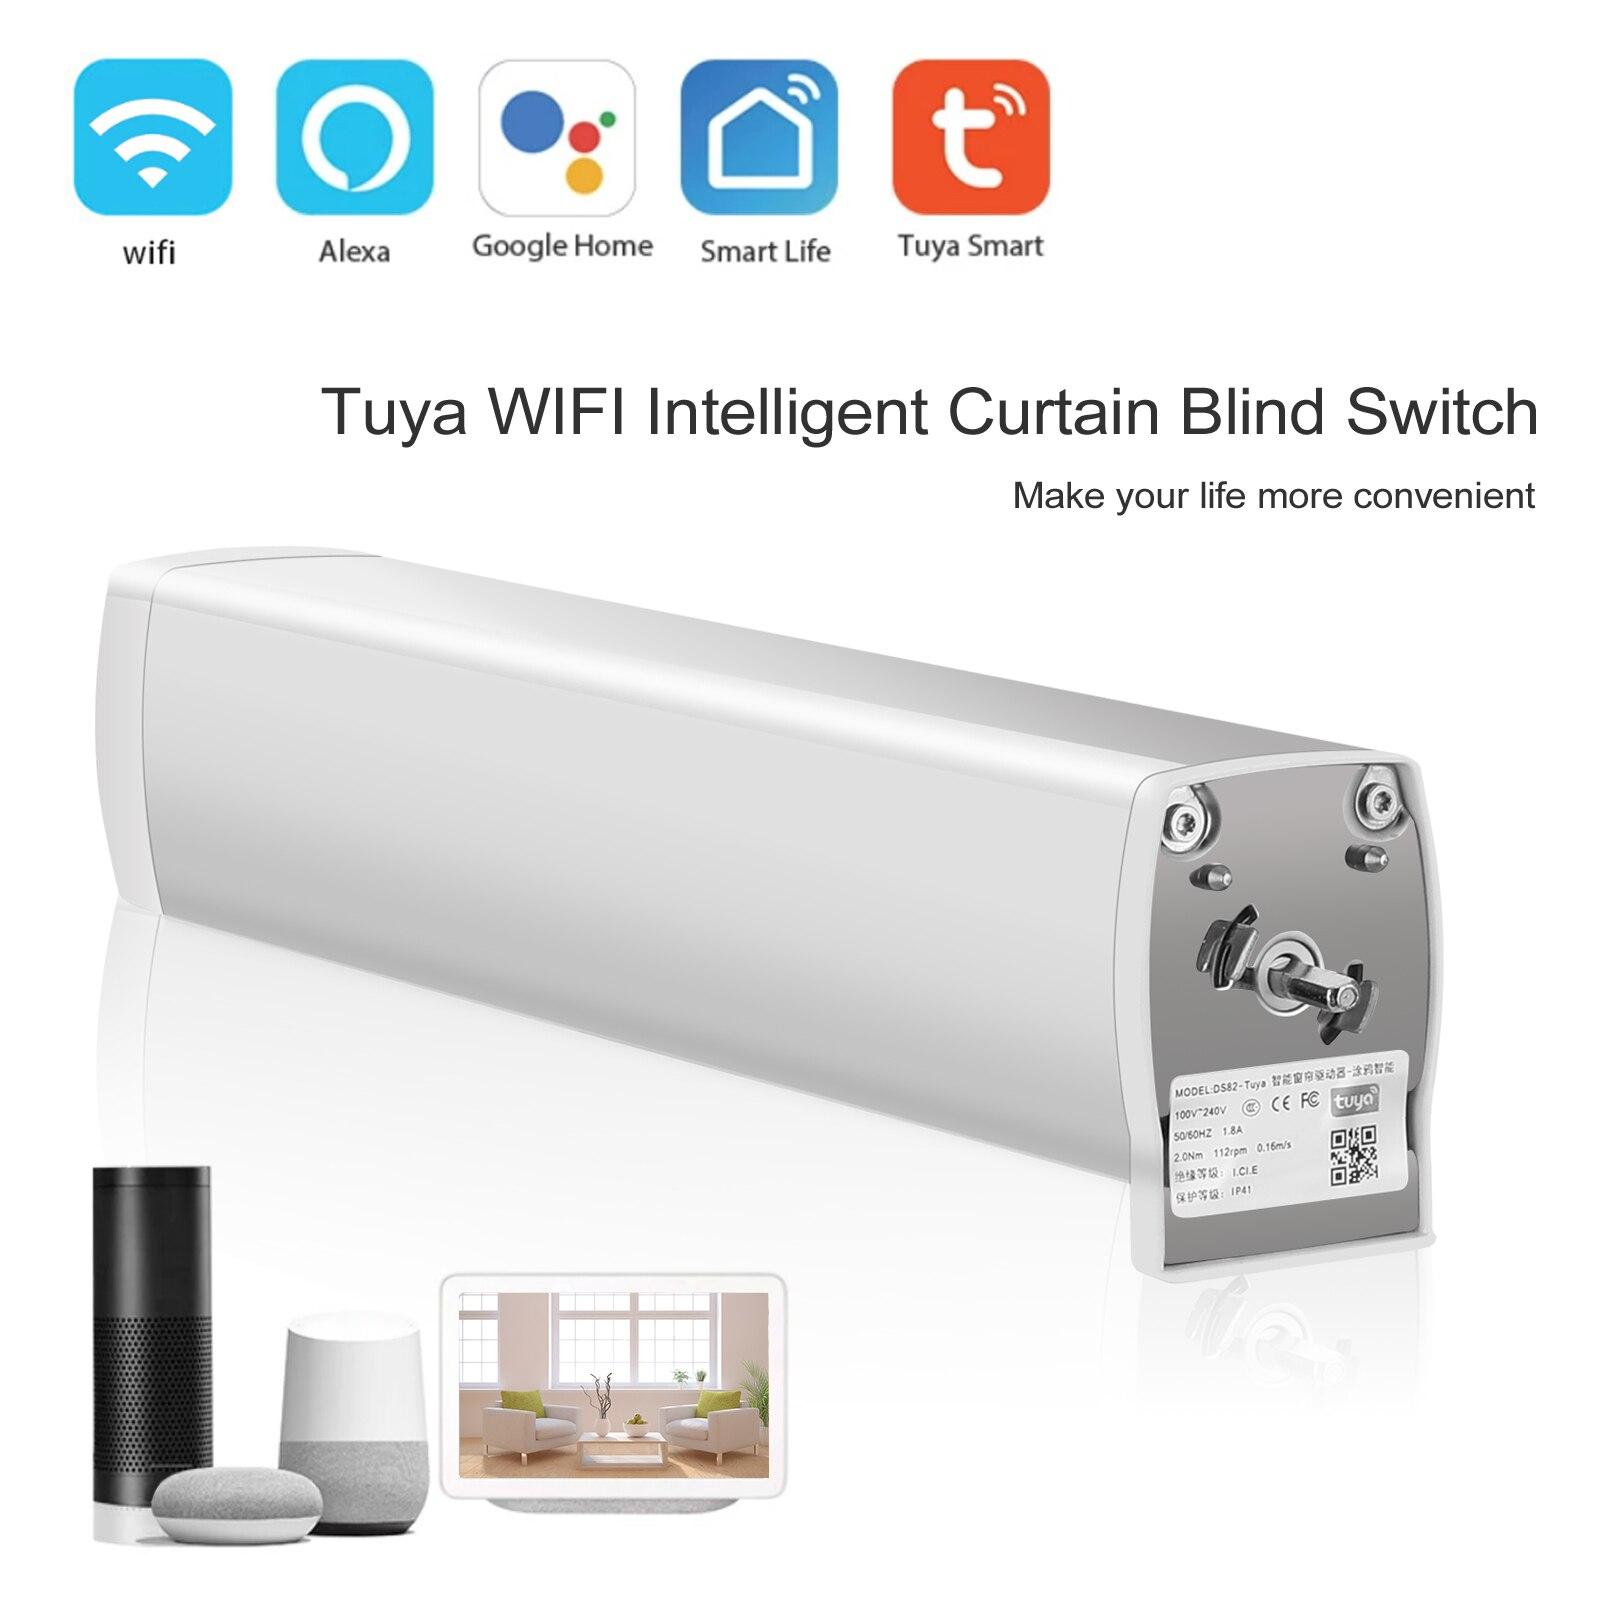 Tuya WIFI Intelligent Curtain Blind Switch Electric Motorized Curtain Roller Shutter Control Switch Remote Control Curtain Motor